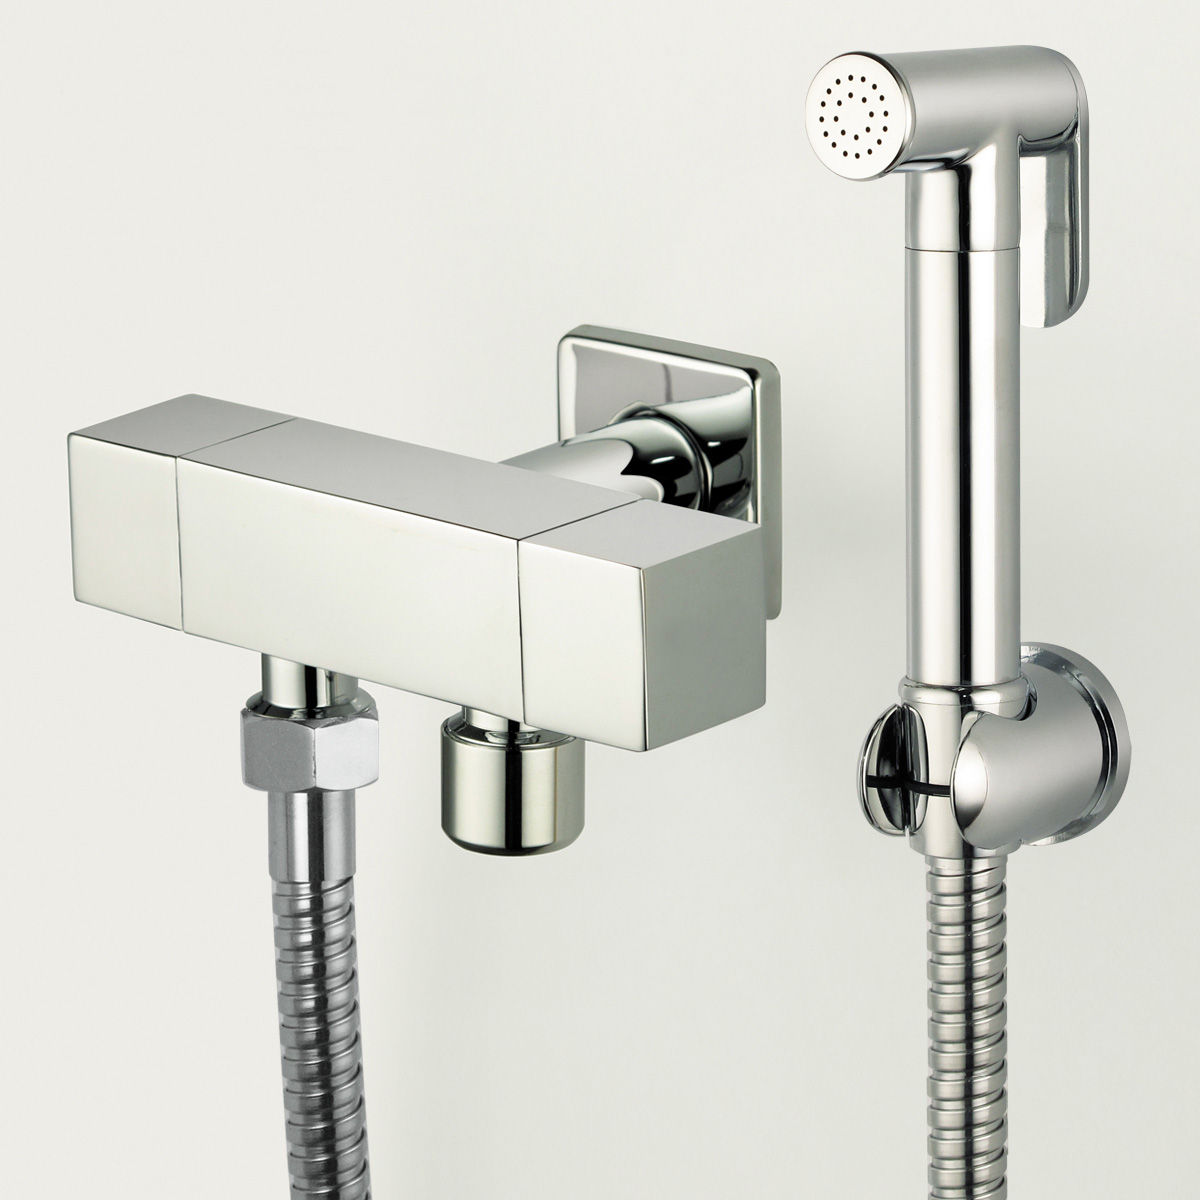 Bidet Faucet Shower Spray Gun Brass Multipurpose Toilet